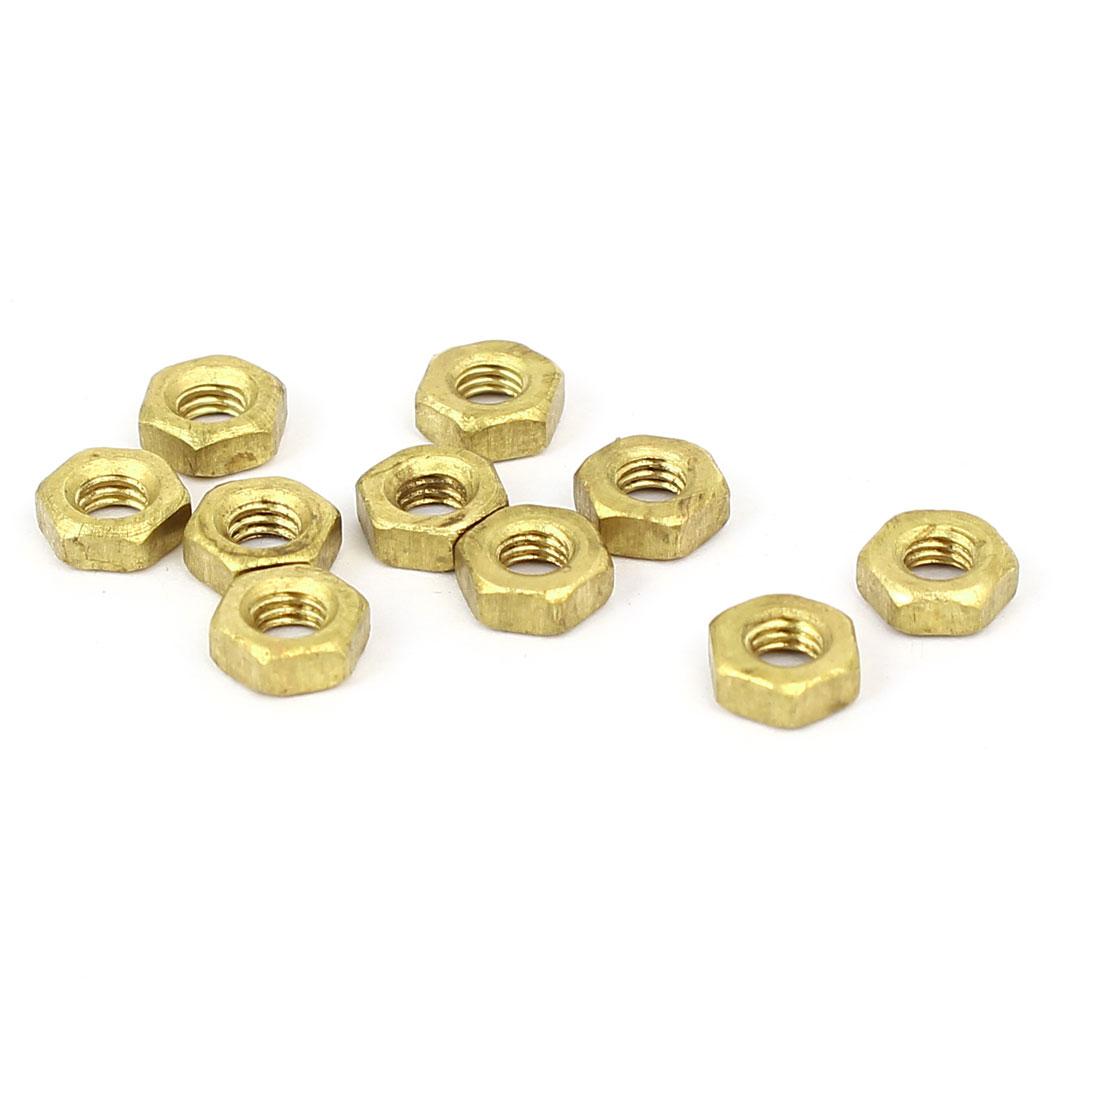 M3 Brass Finished Metric Hex Nut Fastener Brass Tone 10pcs